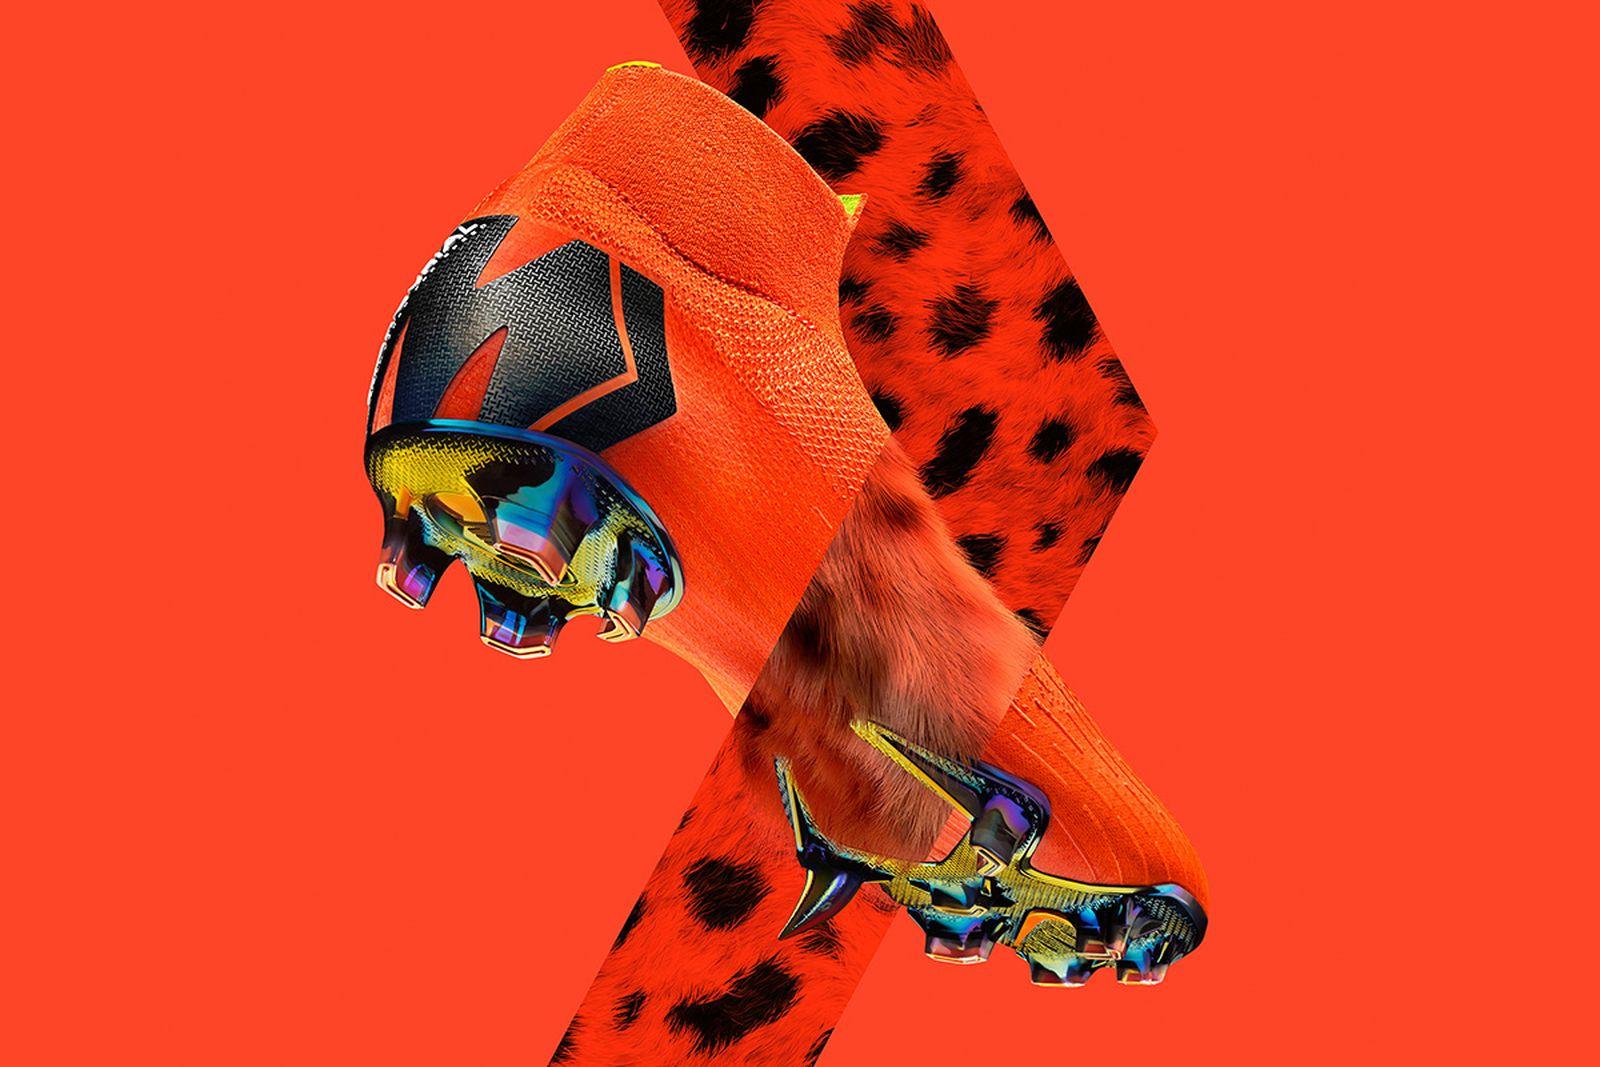 nike-mercurial-superfly-football-boot-1